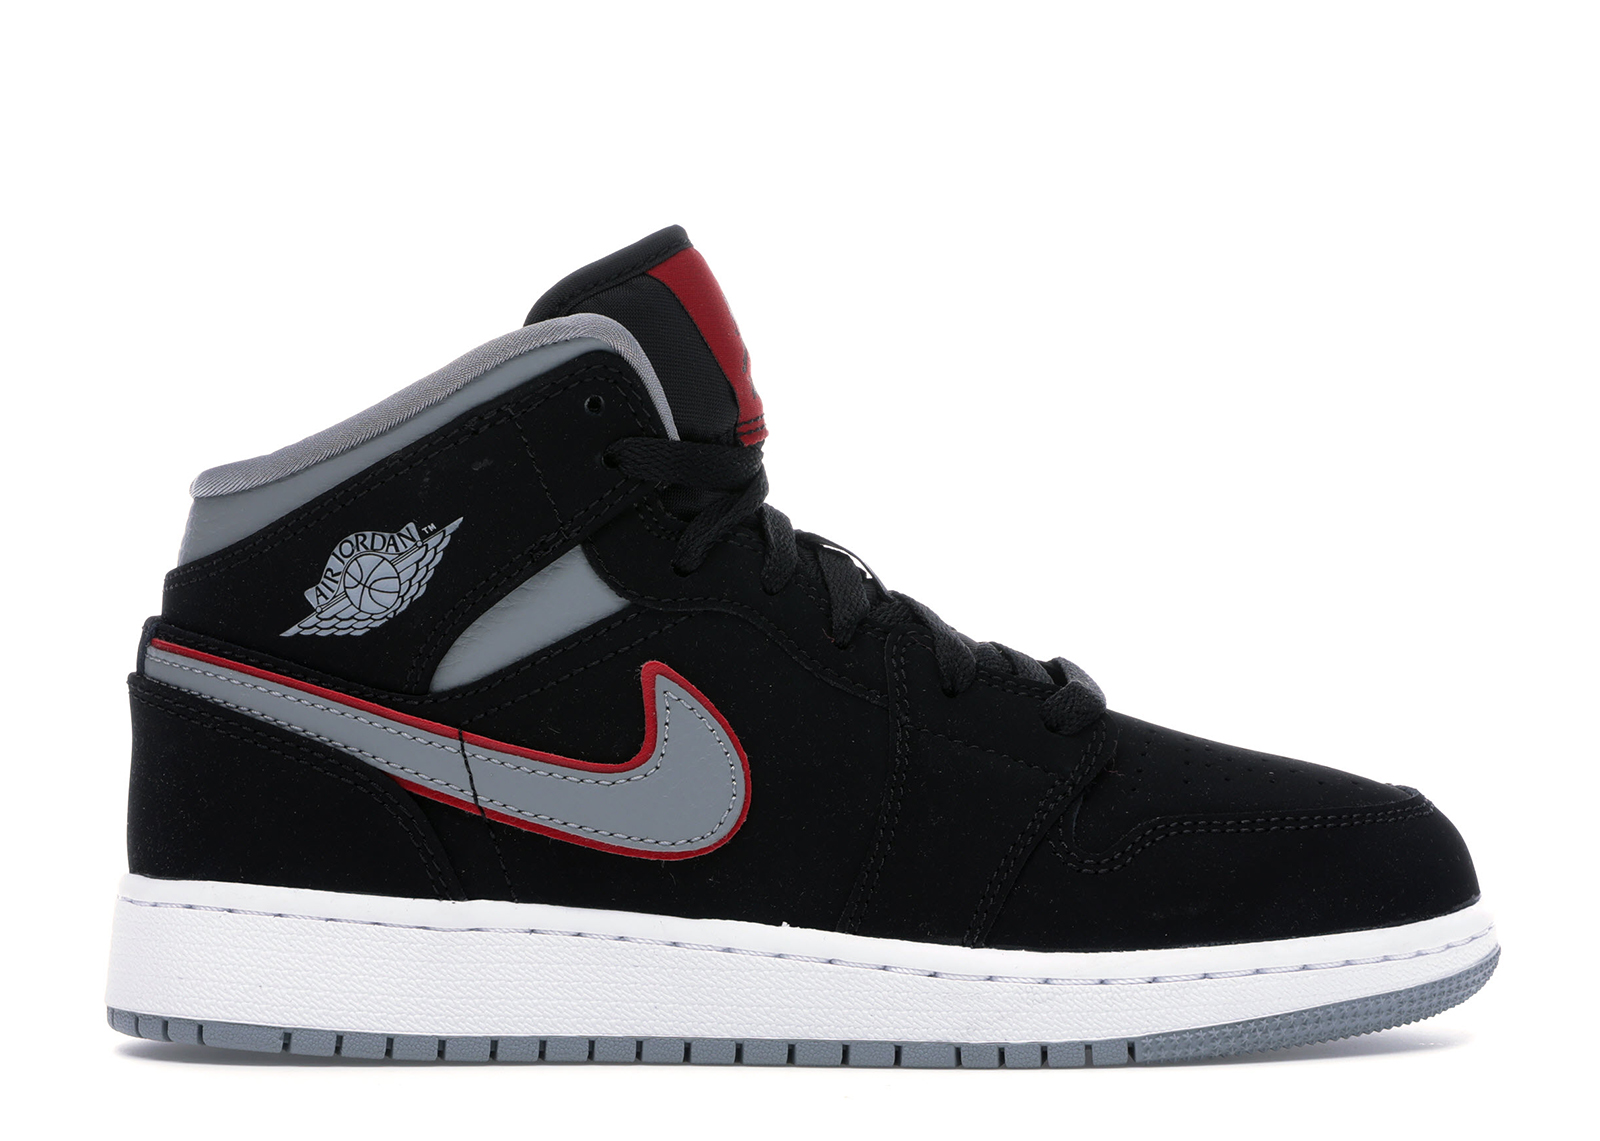 Jordan 1 Mid Black Particle Grey Gym Red (GS)